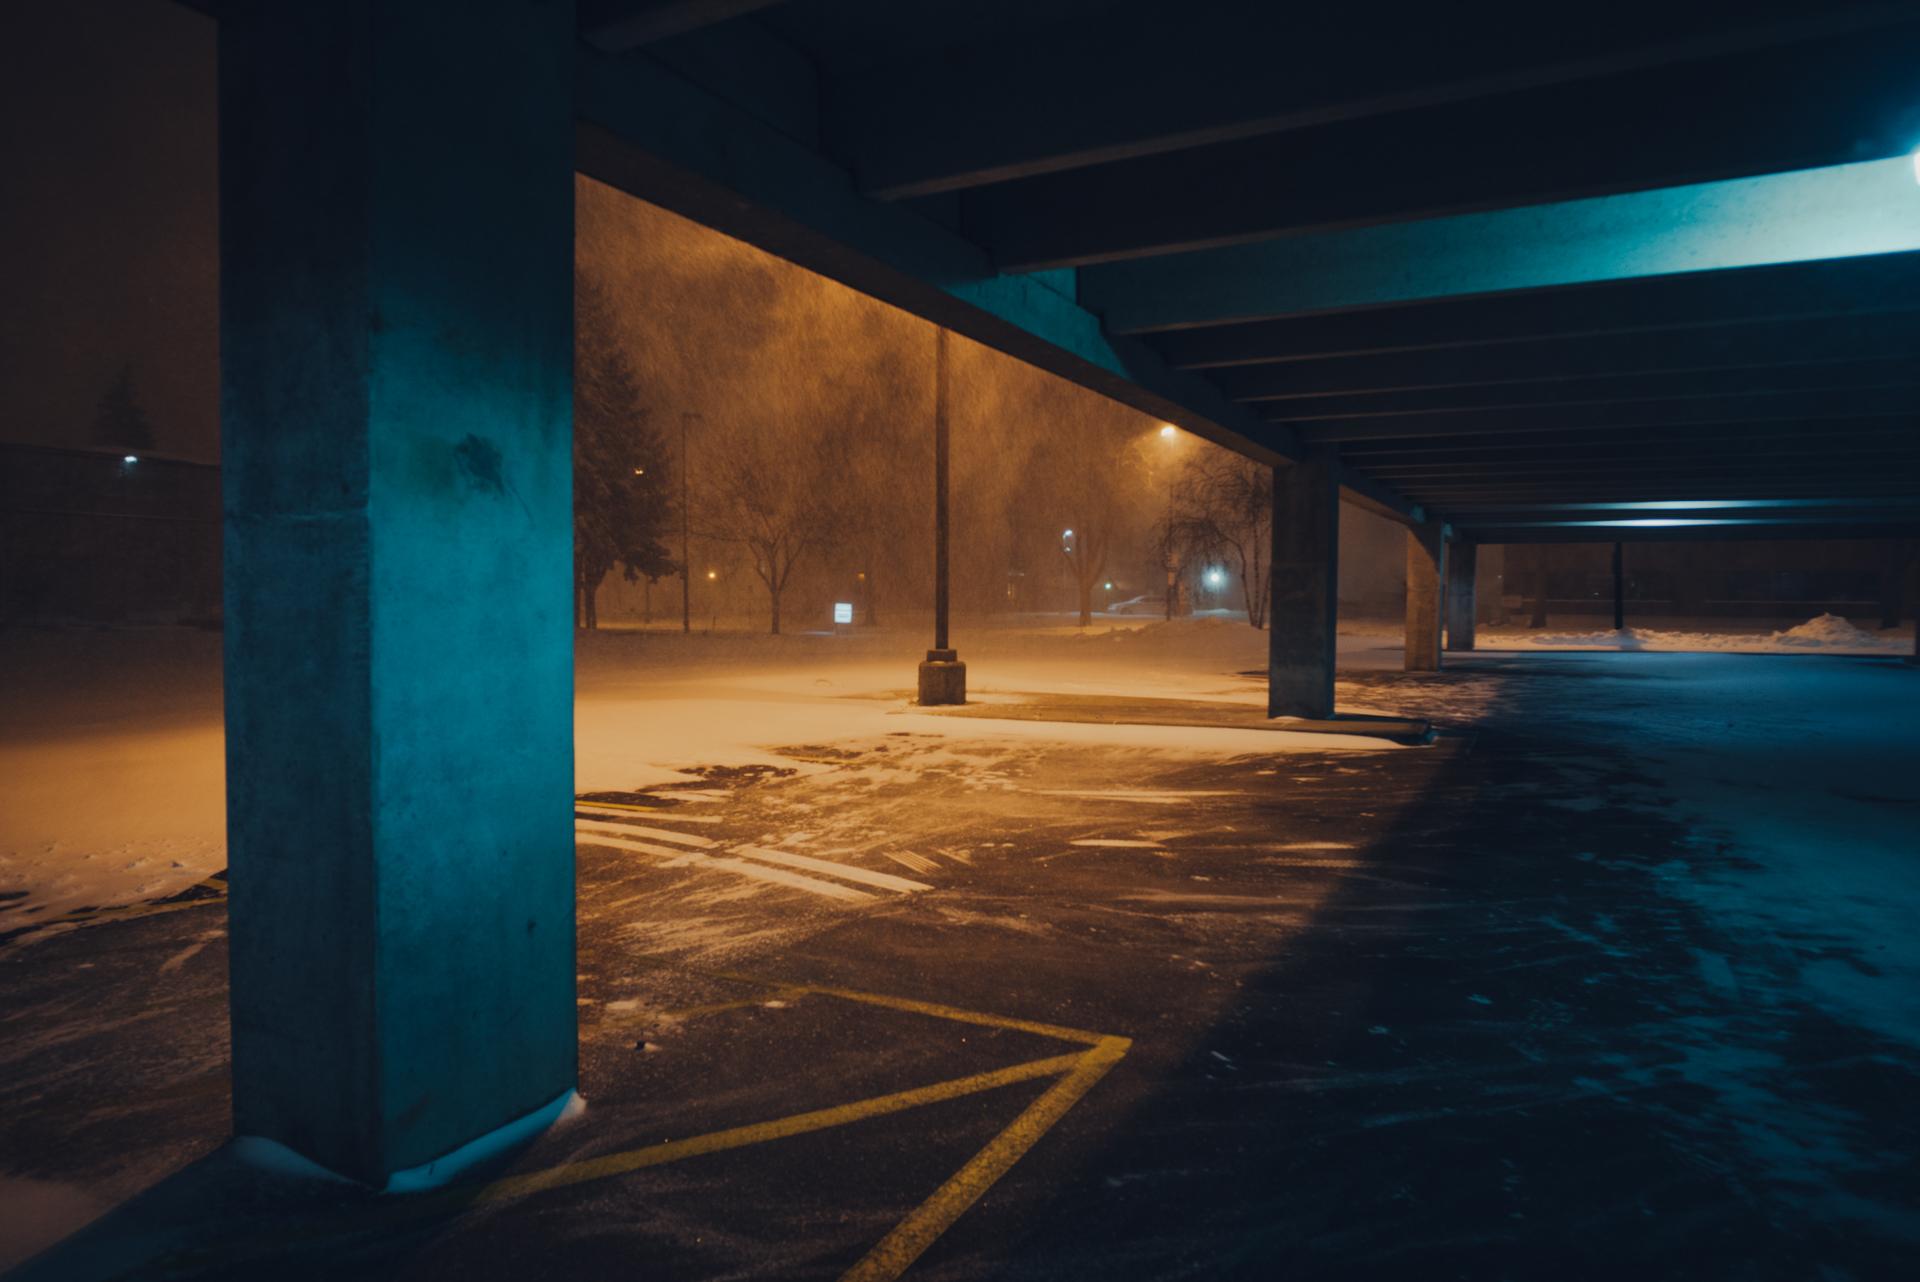 spaces+light-21.jpg